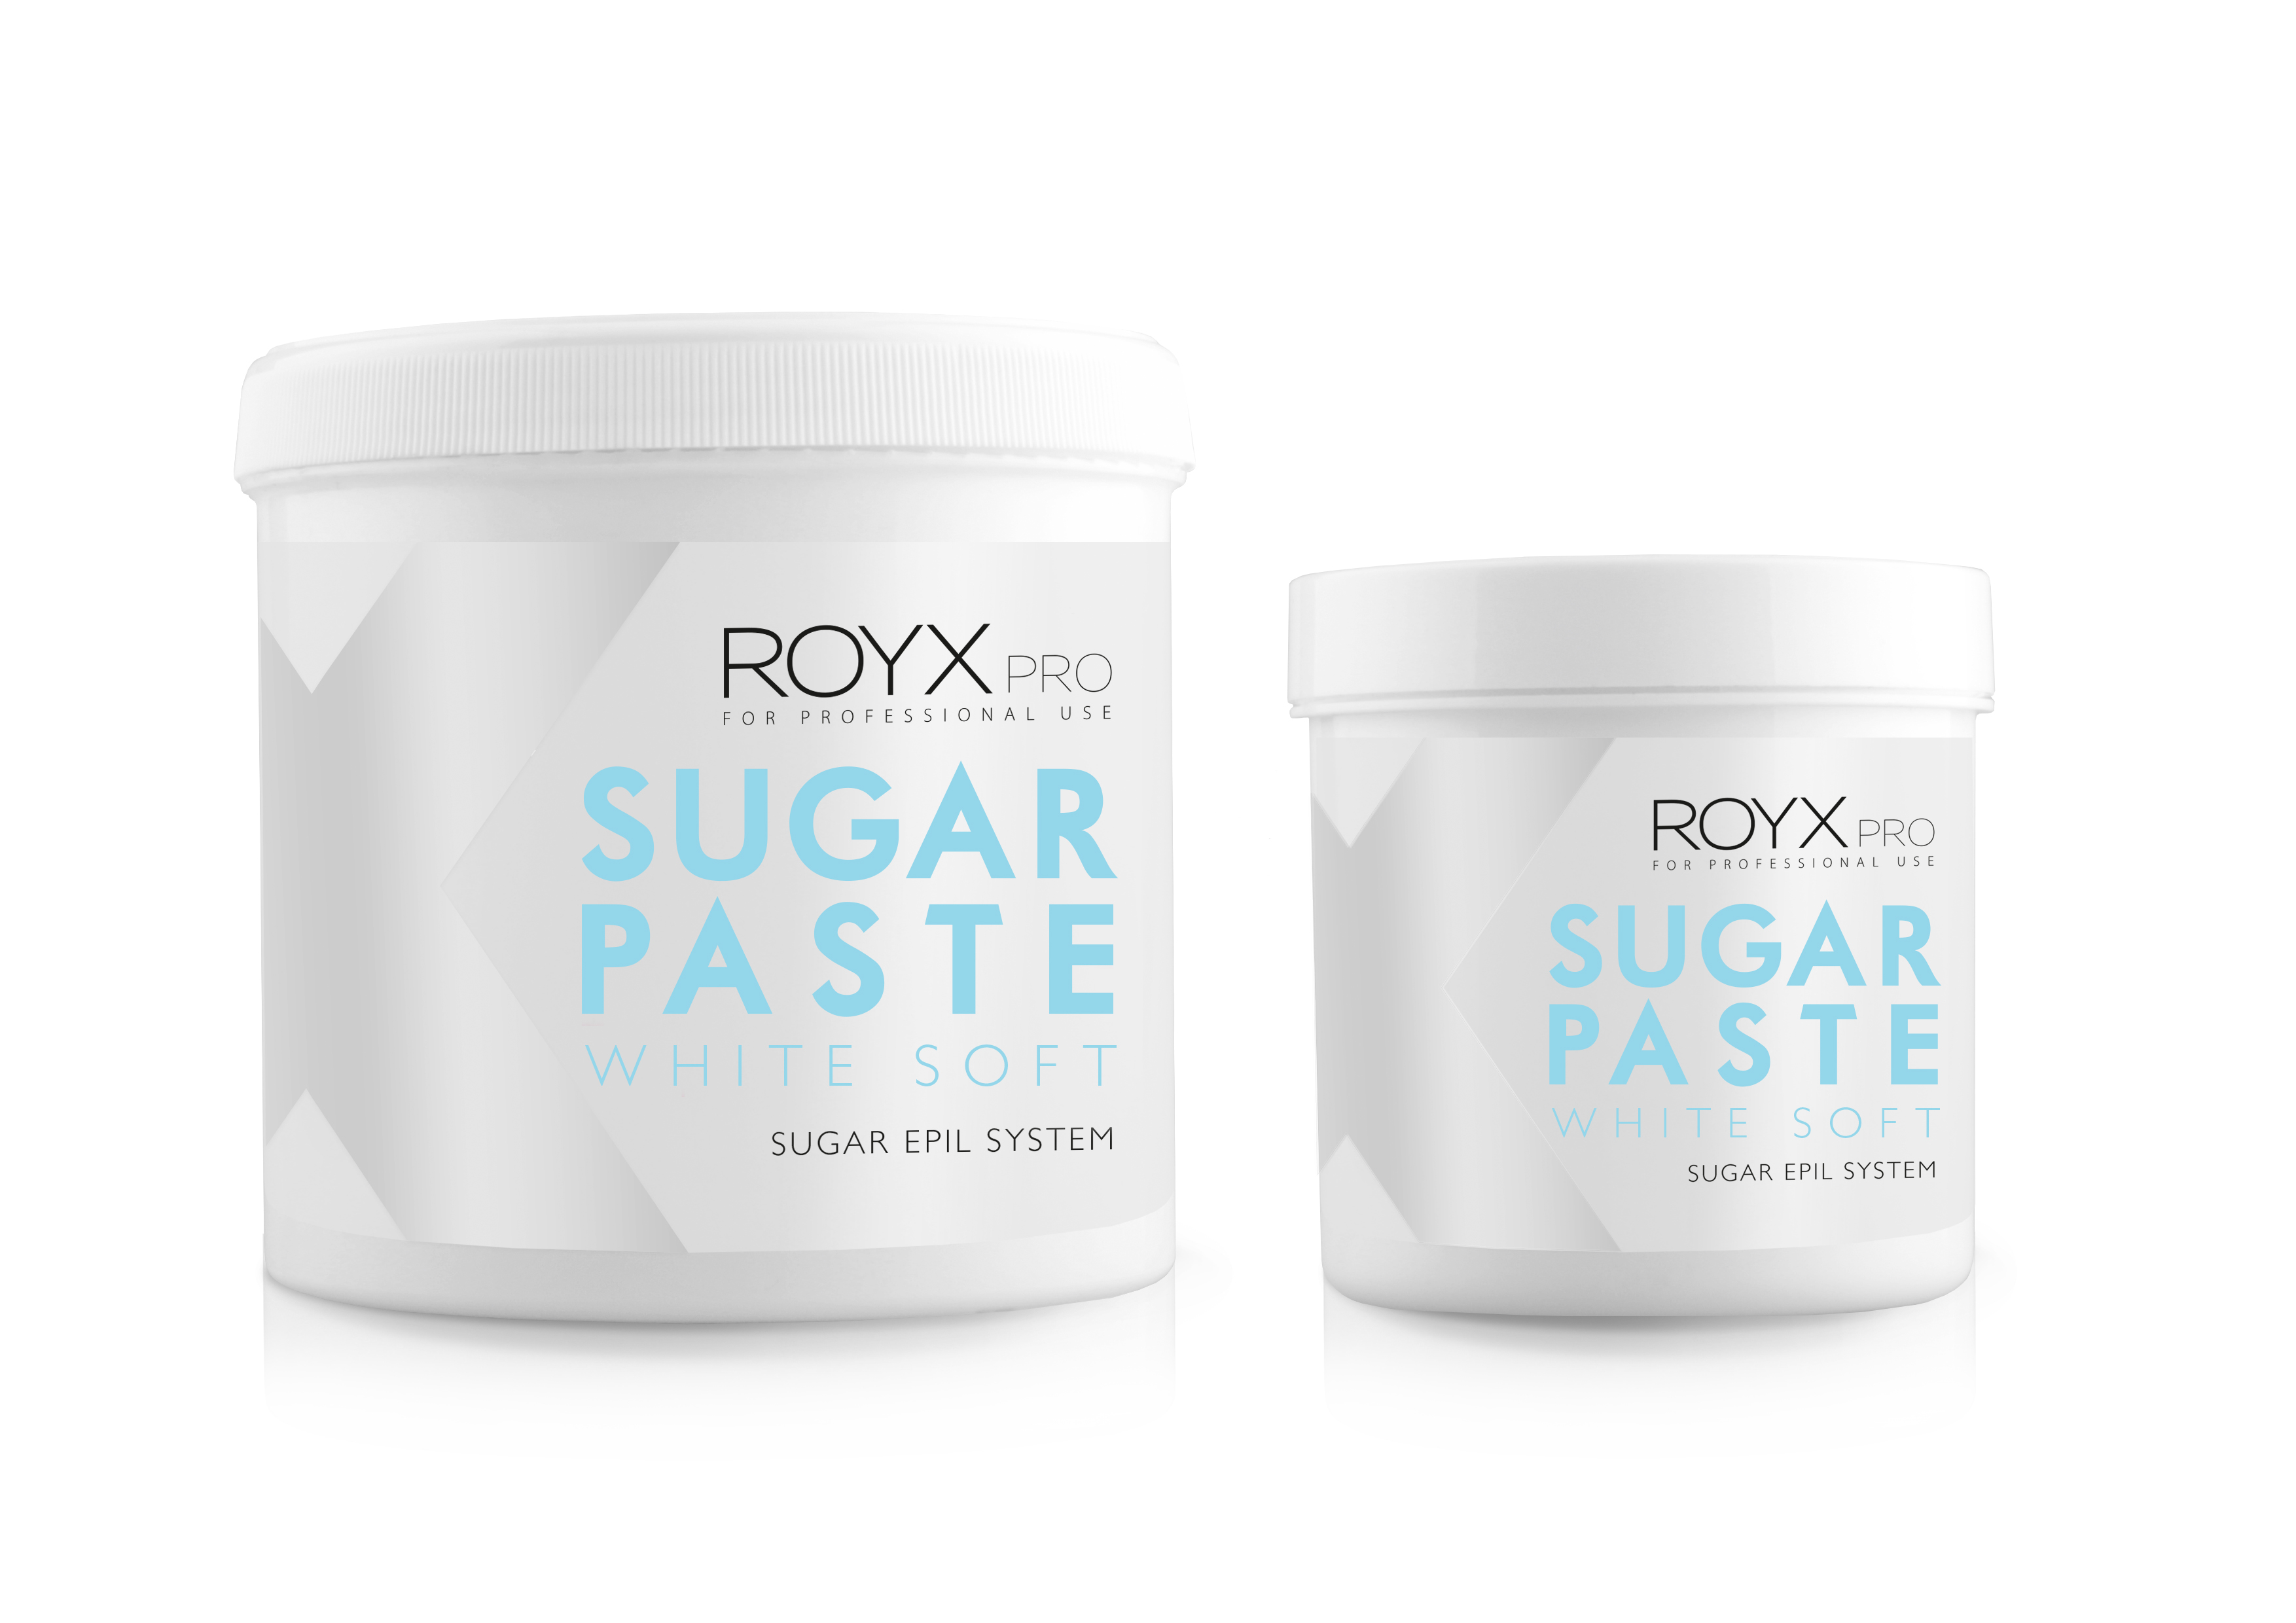 royx_sugar-paste_white-soft